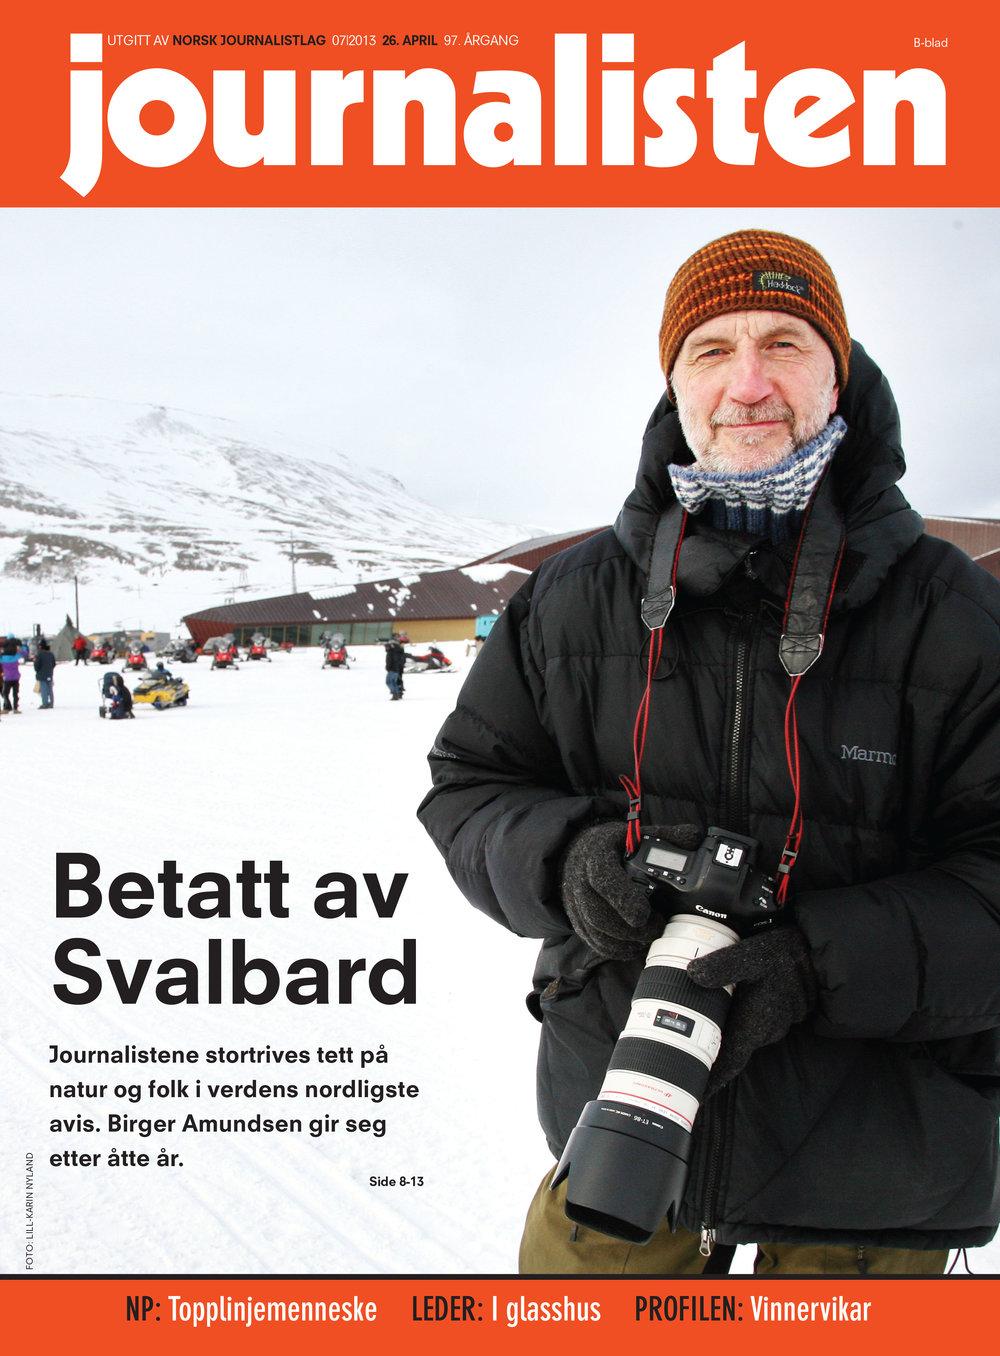 Copy of Journalisetn